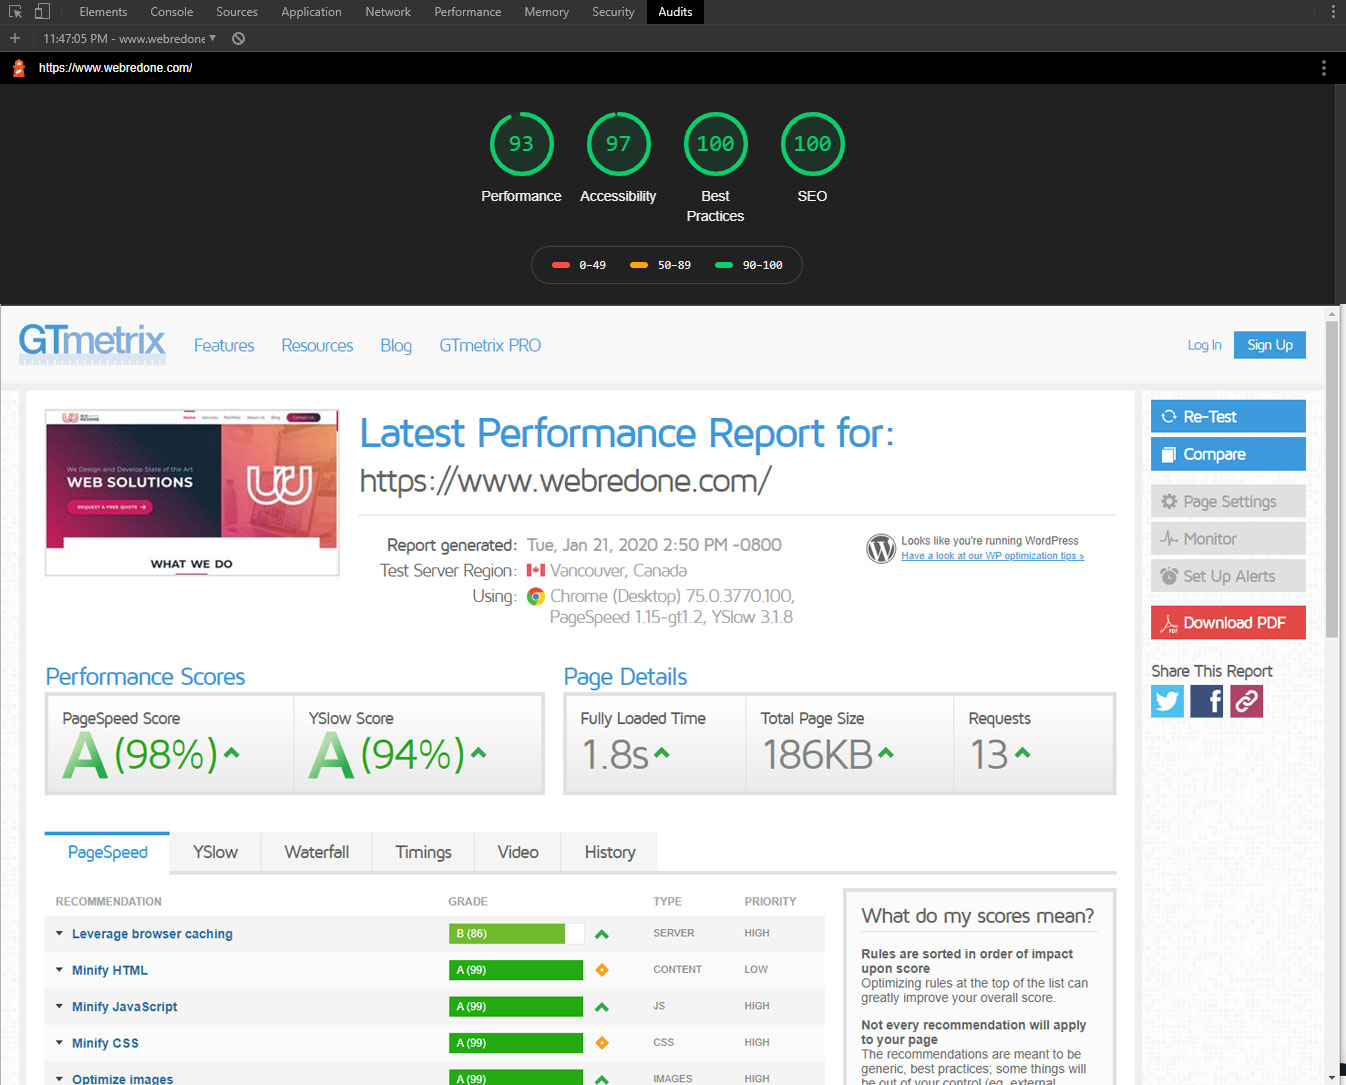 Web Redone Performance Scores